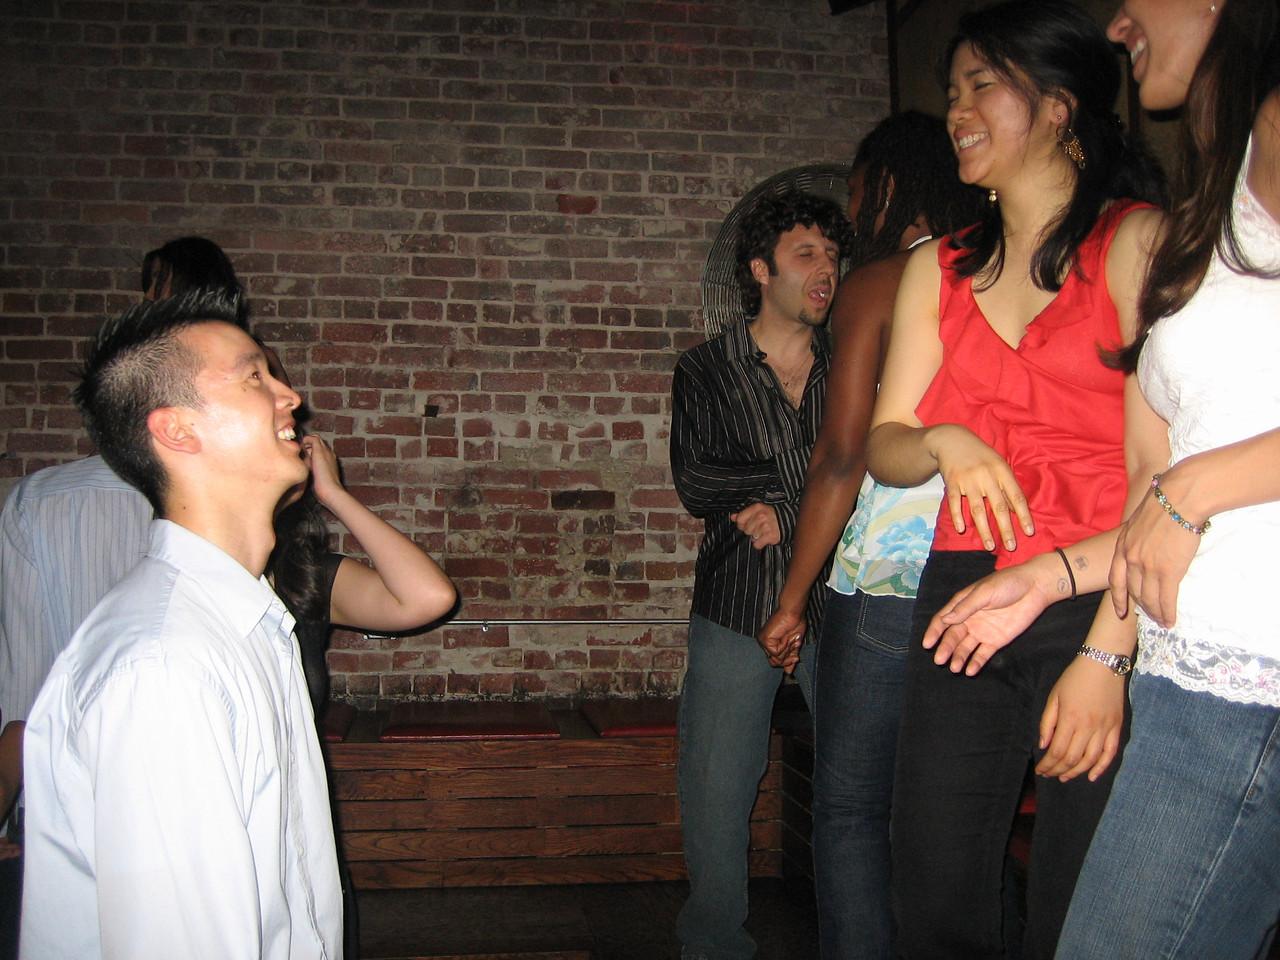 2005 06 04 Saturday - Dragon Bar - Brian Chew ogles the stage ladies